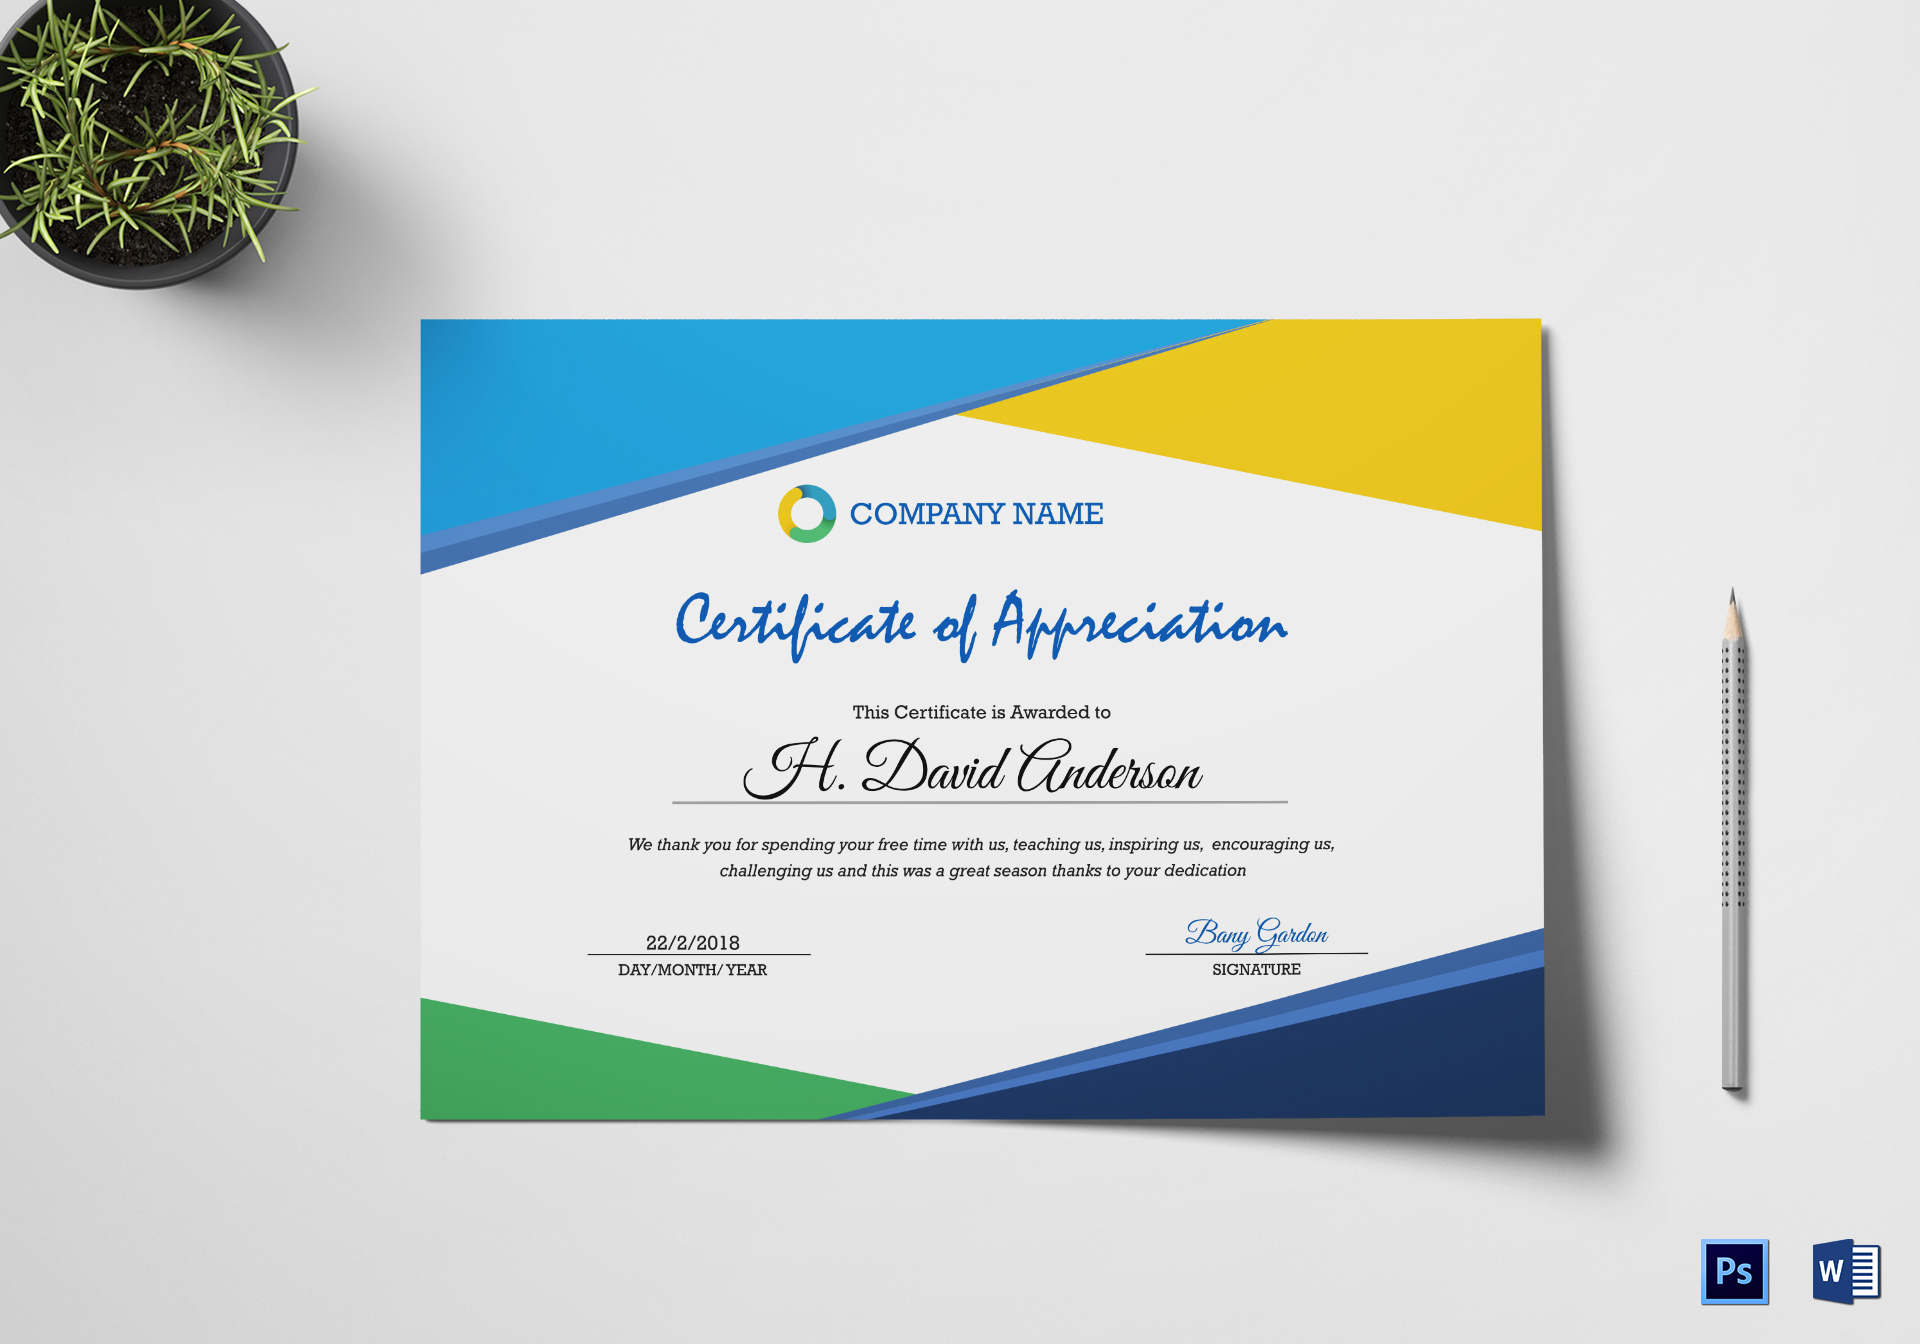 Company Appreciation Certificate Design Template In Psd Word